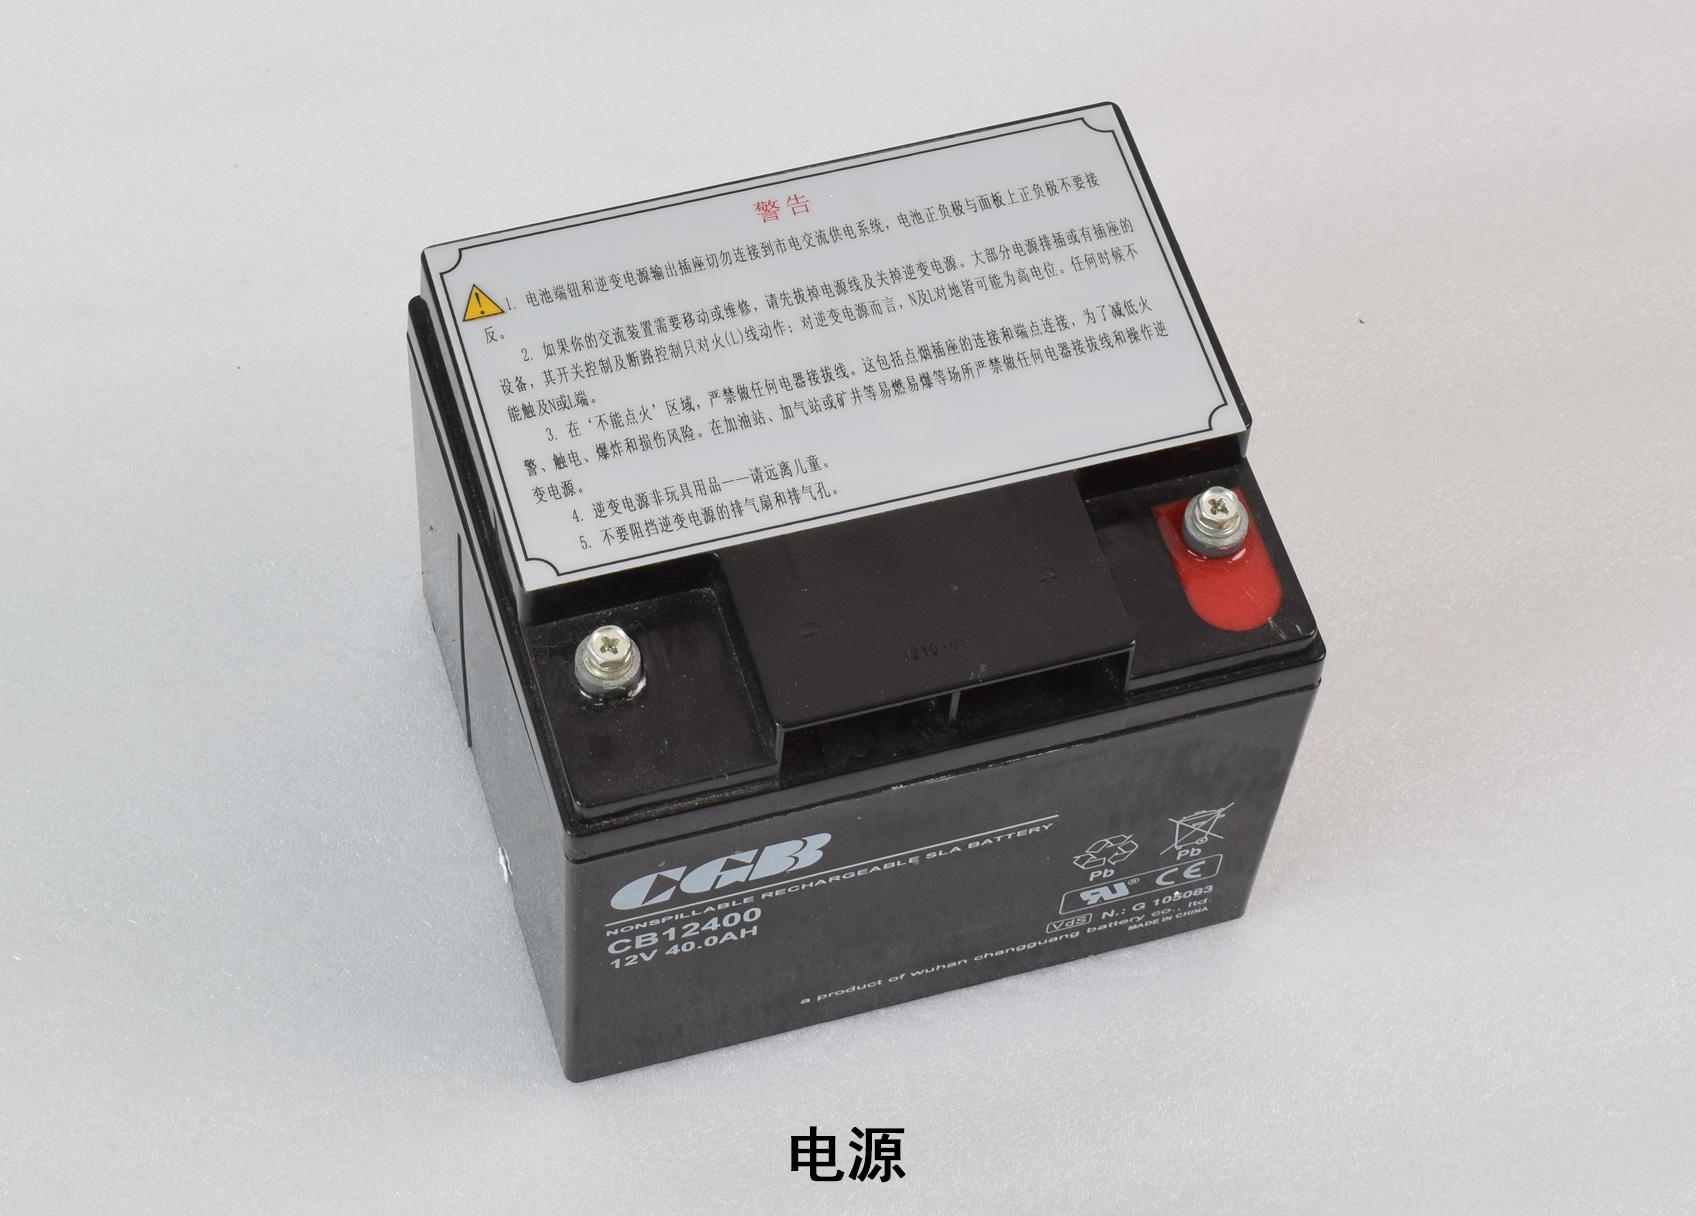 CR-600W现场试验电源电池